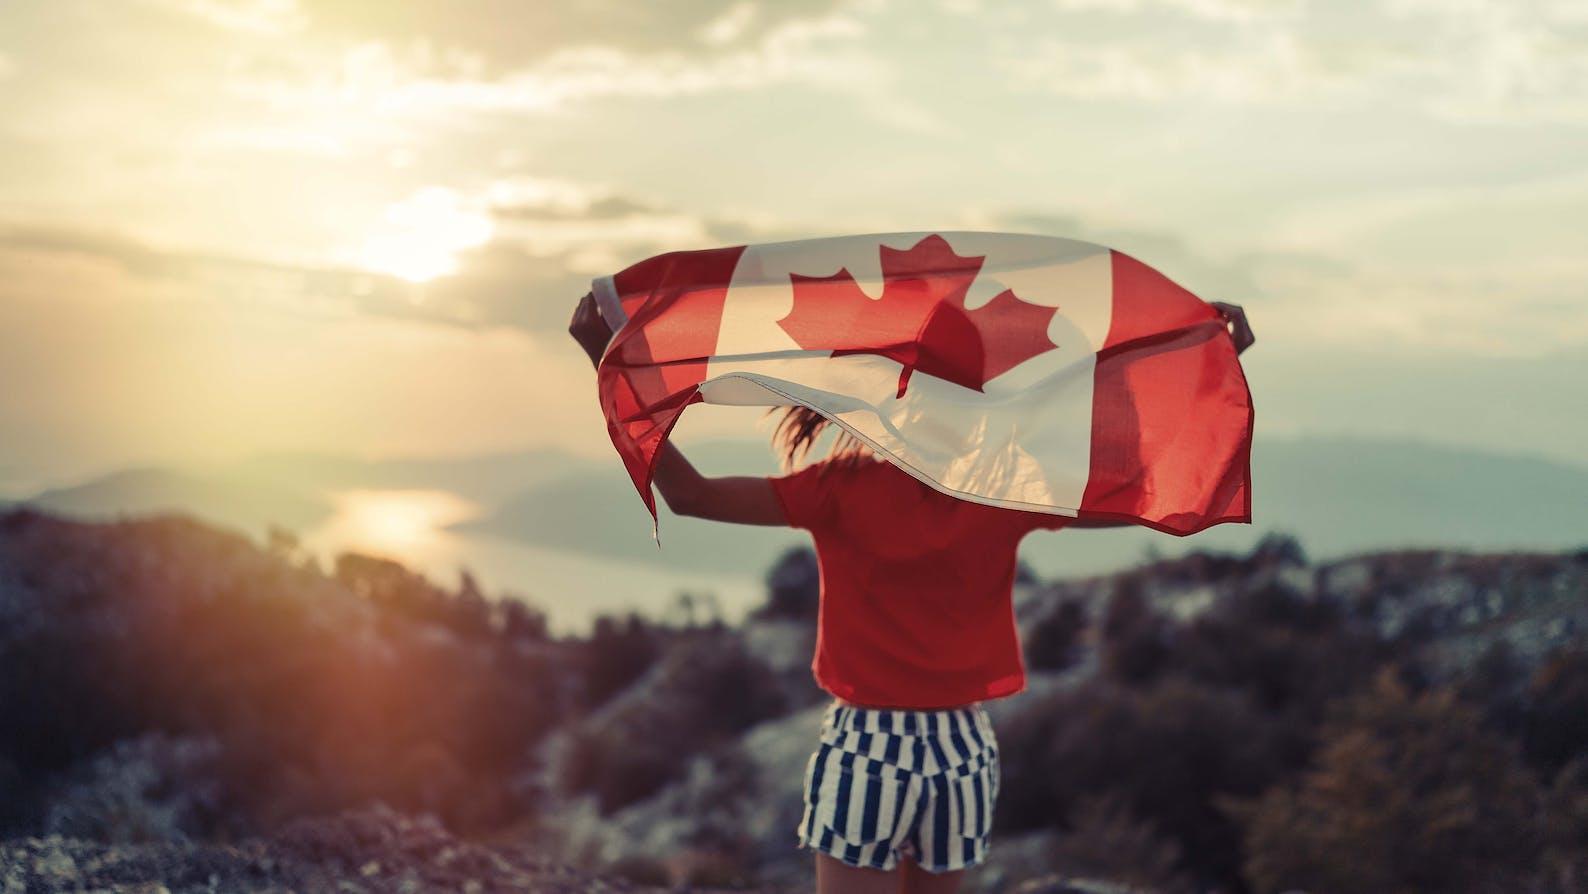 Canadian flag waving